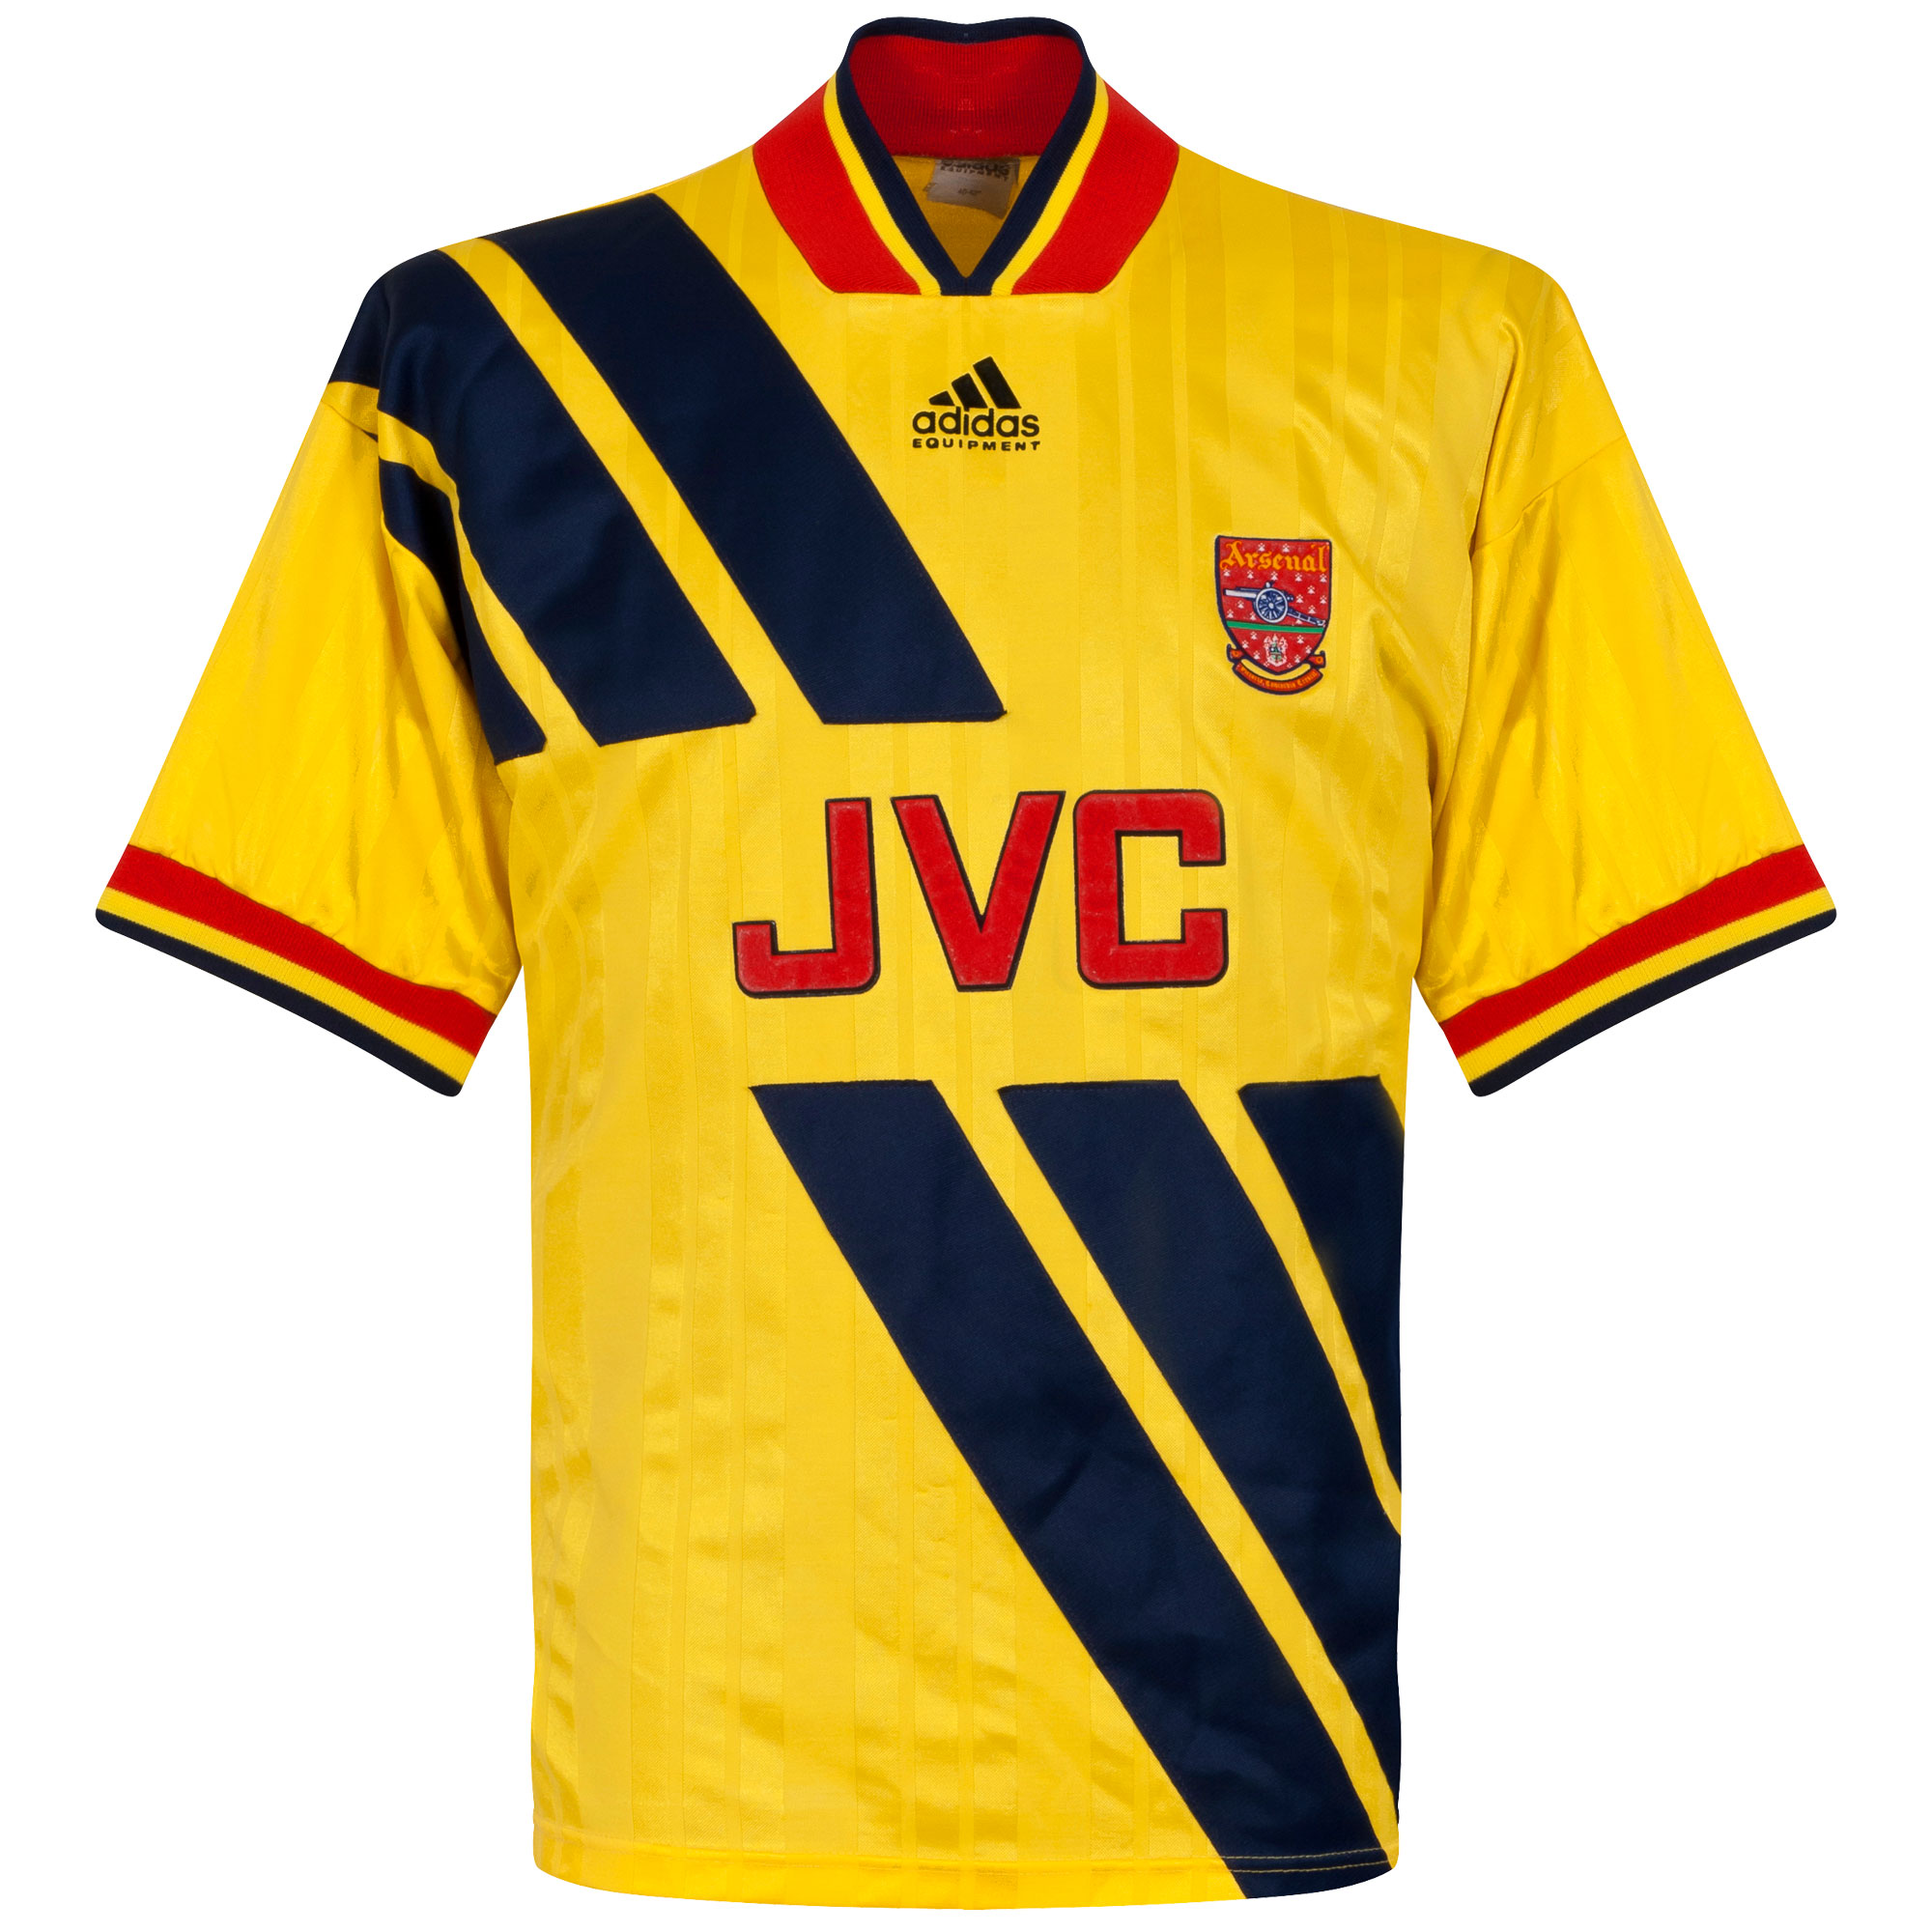 adidas Arsenal 1993-1994 Away Shirt - USED Condition (Good) - Size